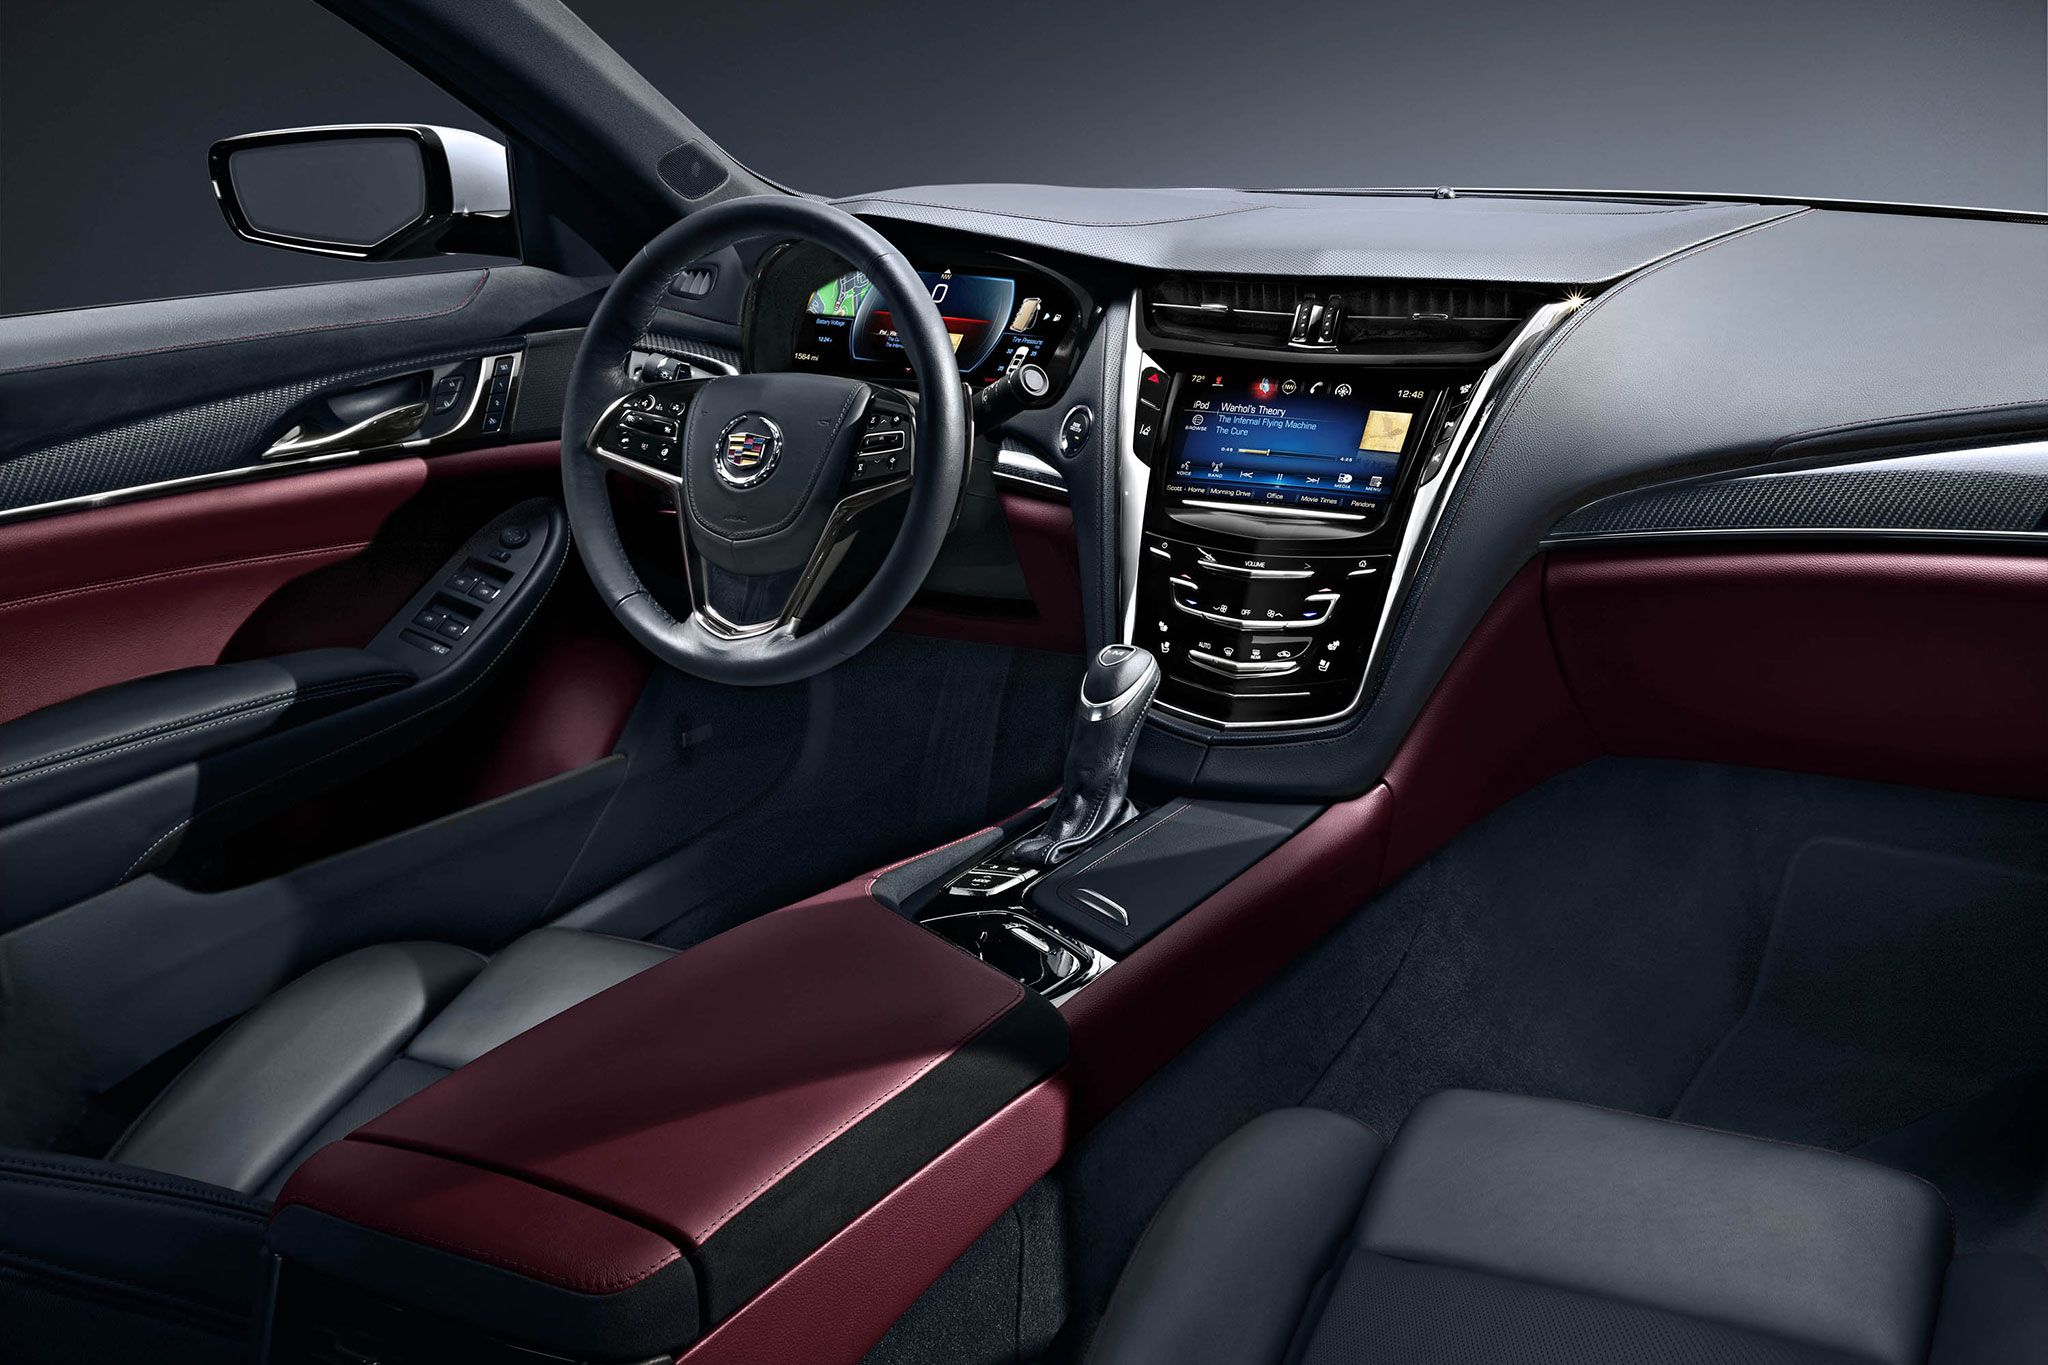 Cadillac Cts Interior Design  Httphdcarwallfxcomcadillac Cts